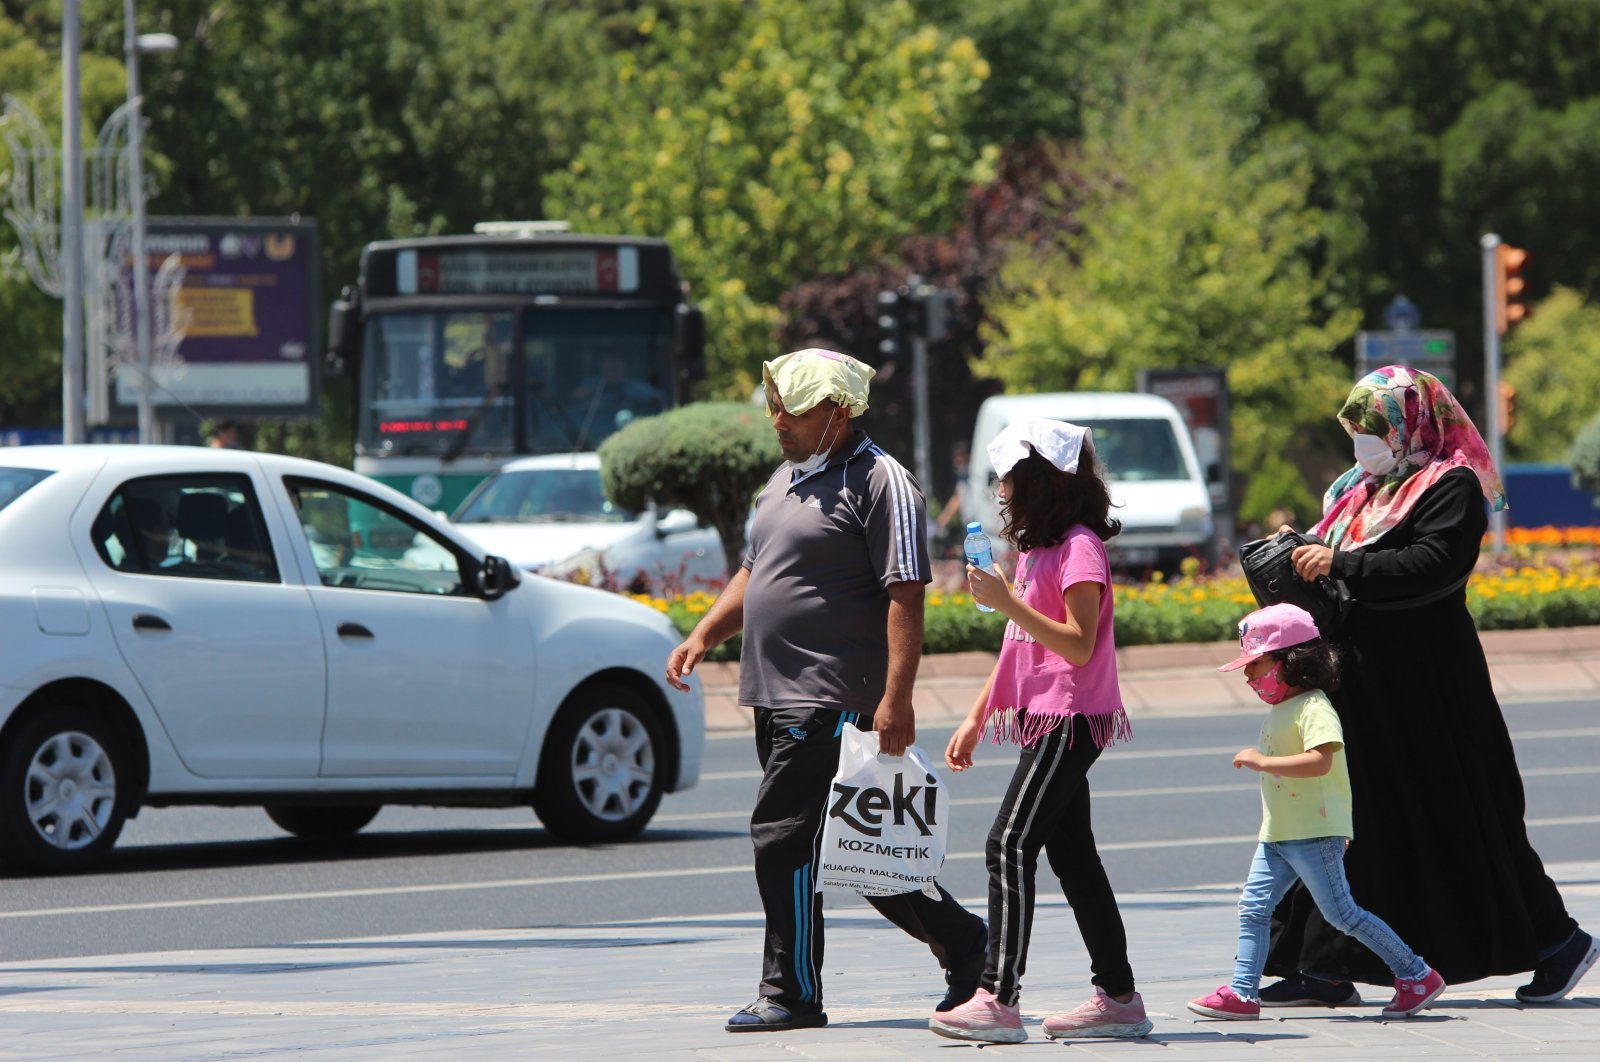 People shielding themselves from the sun cross the street in Kayseri, Turkey, July 19, 2020. (İHA Photo)